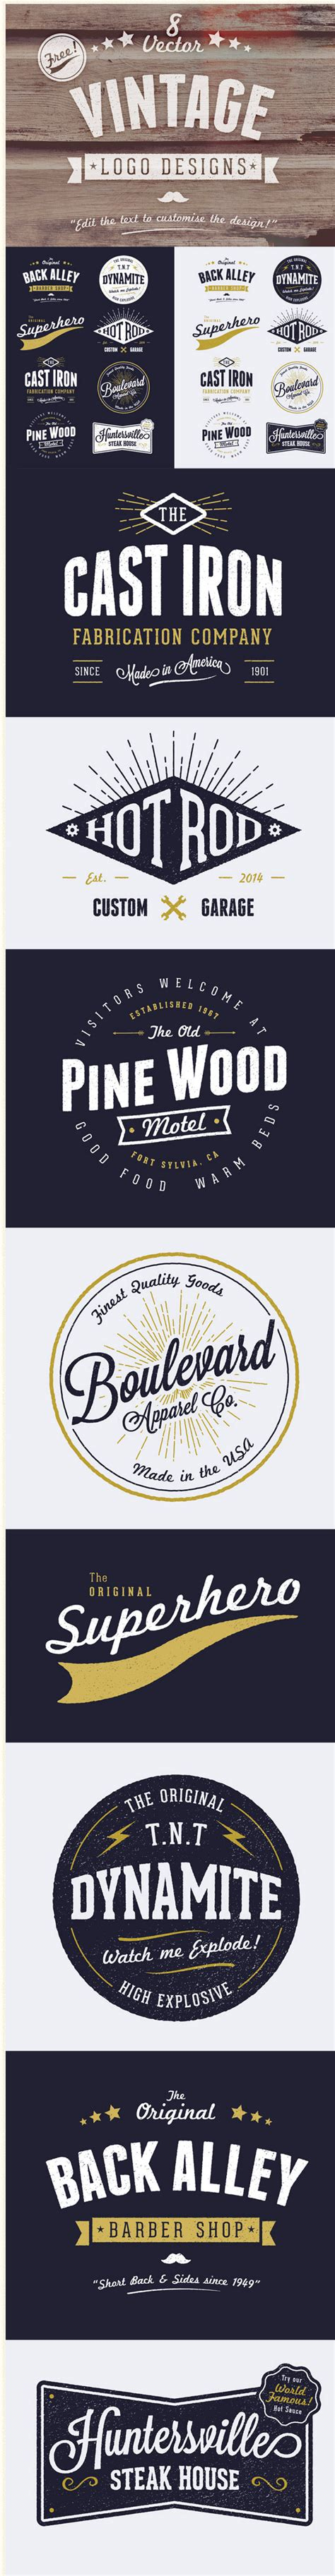 desain logo online gratis vector vintage gratis untuk desain logo